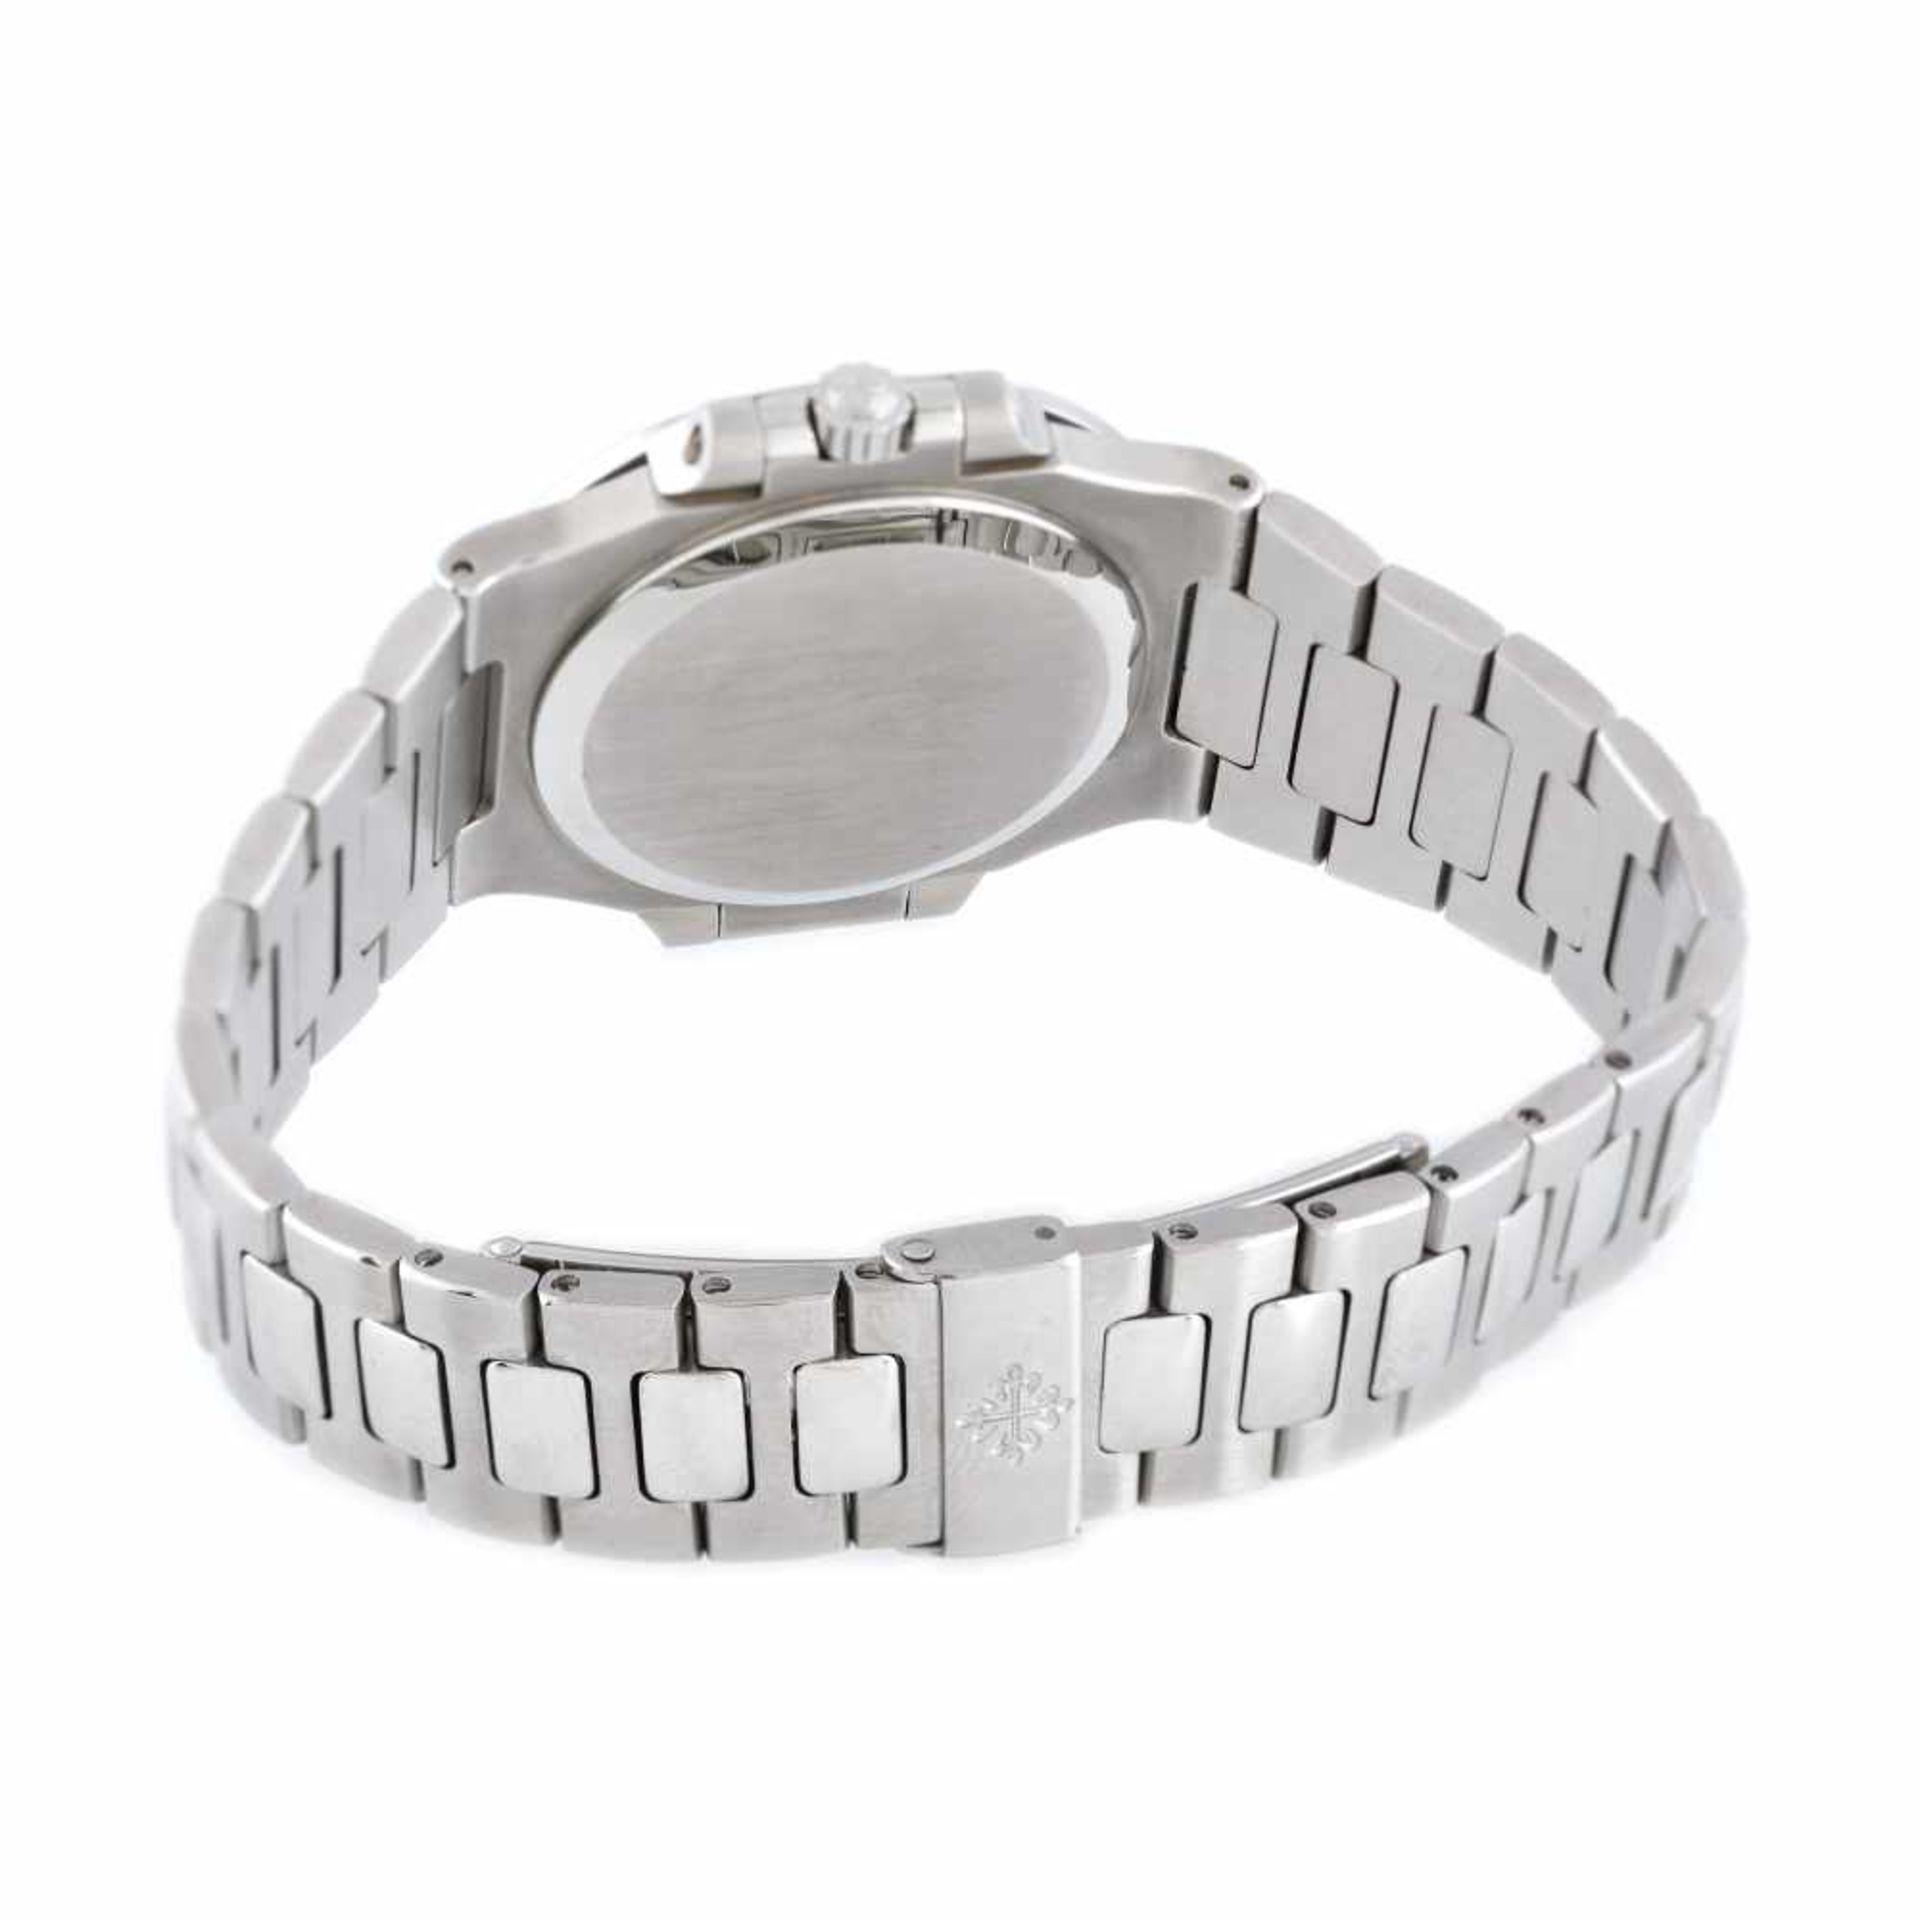 Patek Philippe Nautilus wristwatch, unisex, provenance documents - Bild 2 aus 2